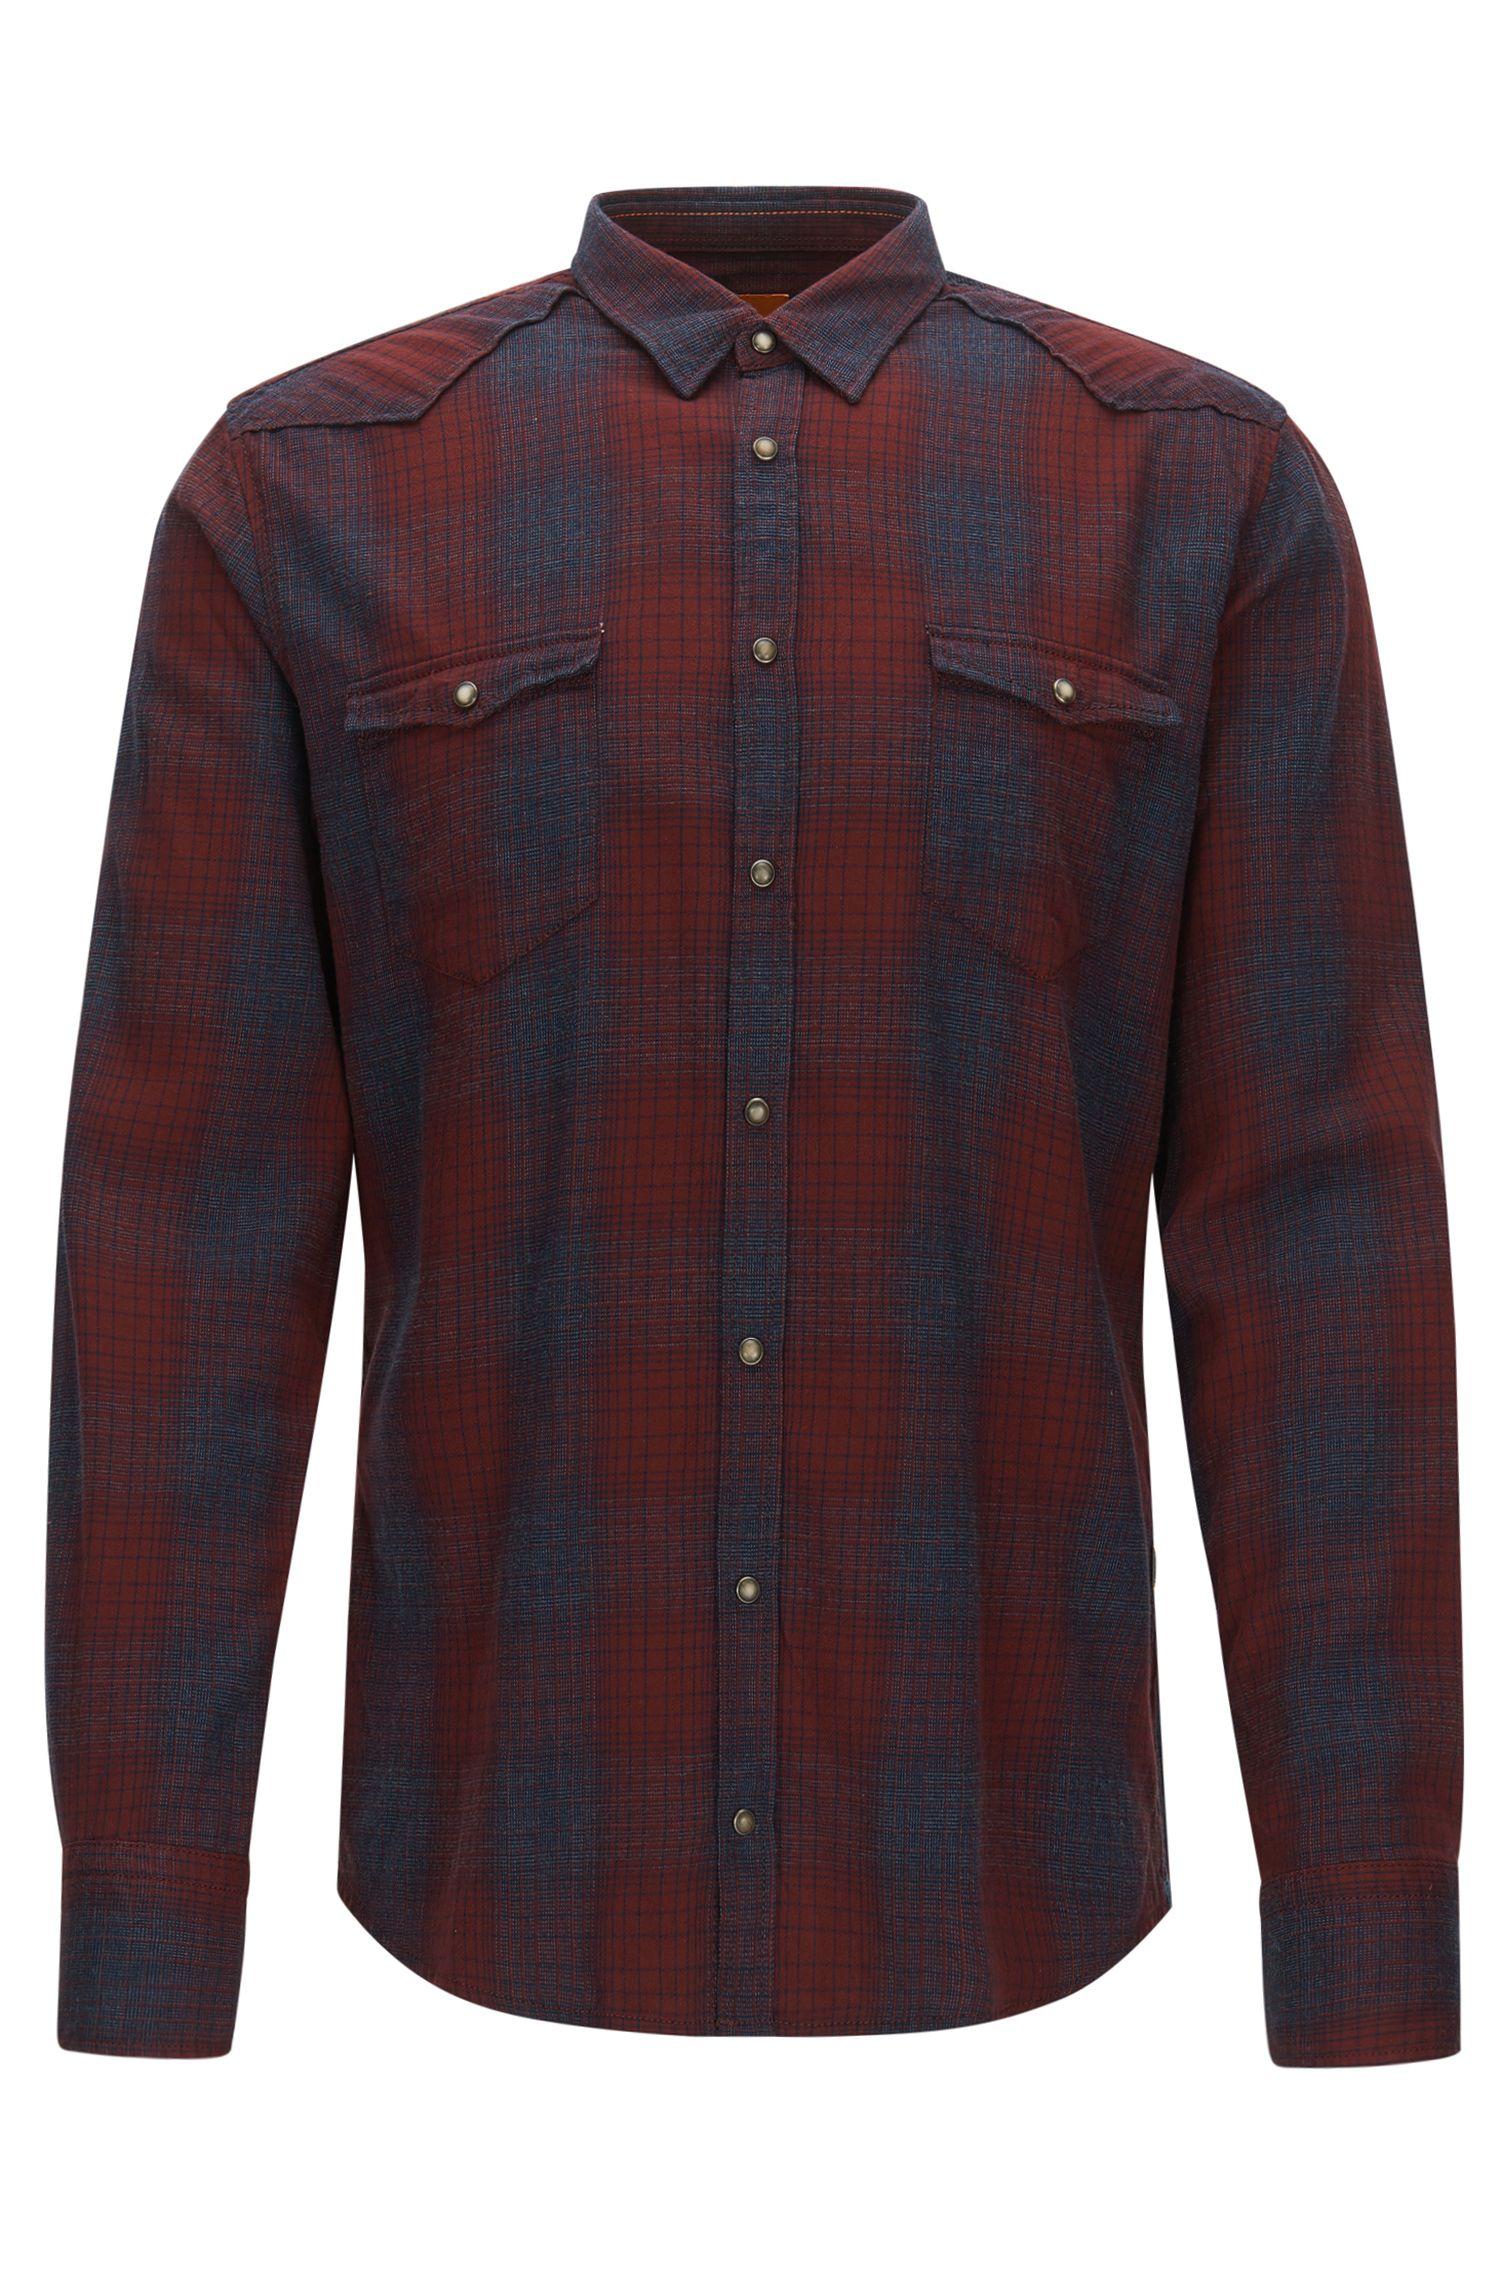 'Erodeo' | Slim Fit, Plaid Stretch Cotton Button Down Shirt